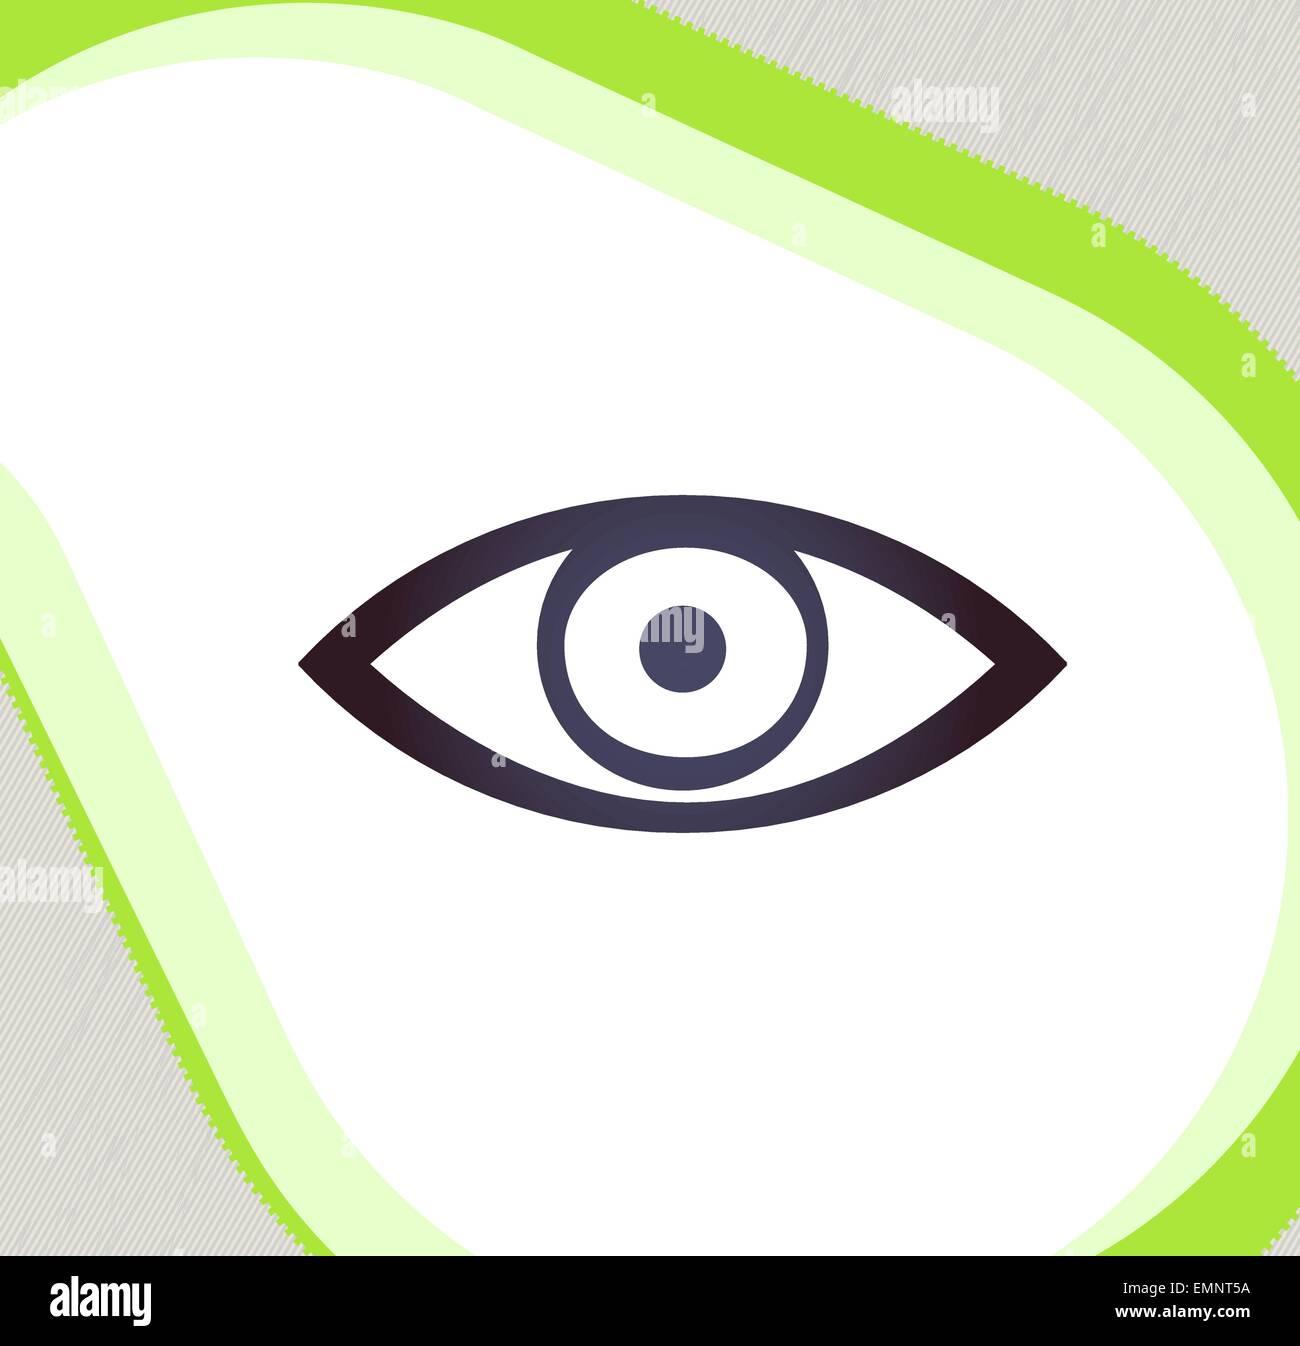 Auge. Retro-Stil-Emblem, Symbol, Piktogramm Stockbild